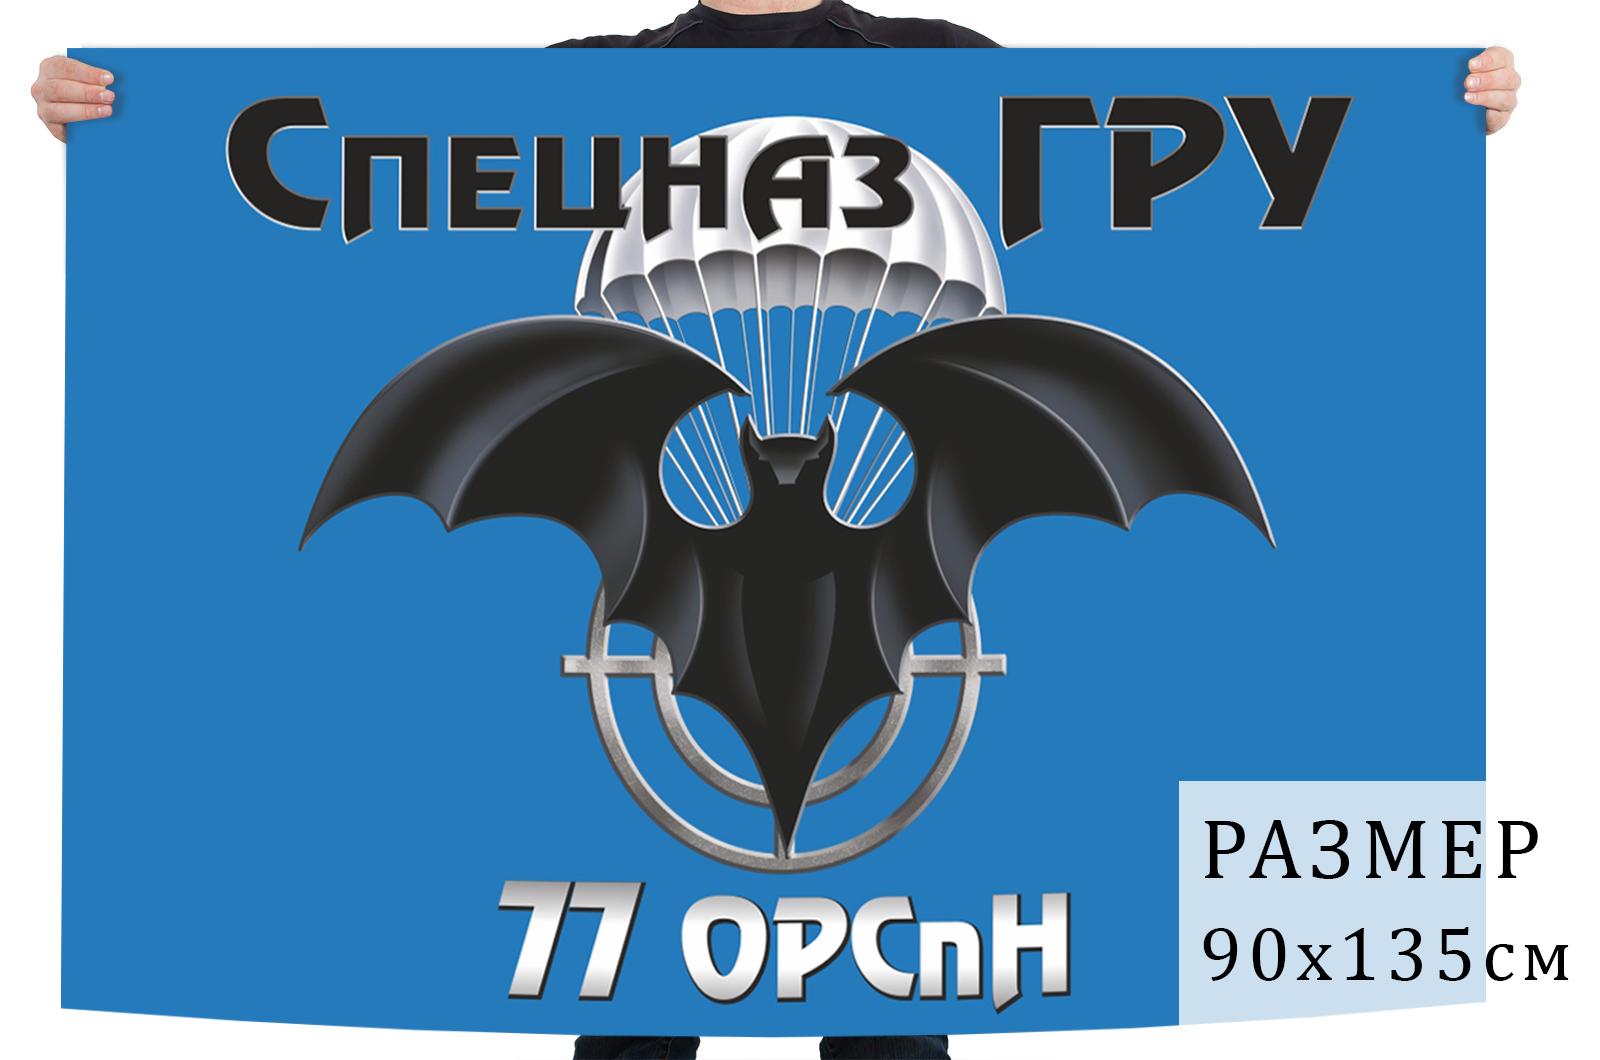 Флаг 74 ОРСпН спецназа ГРУ